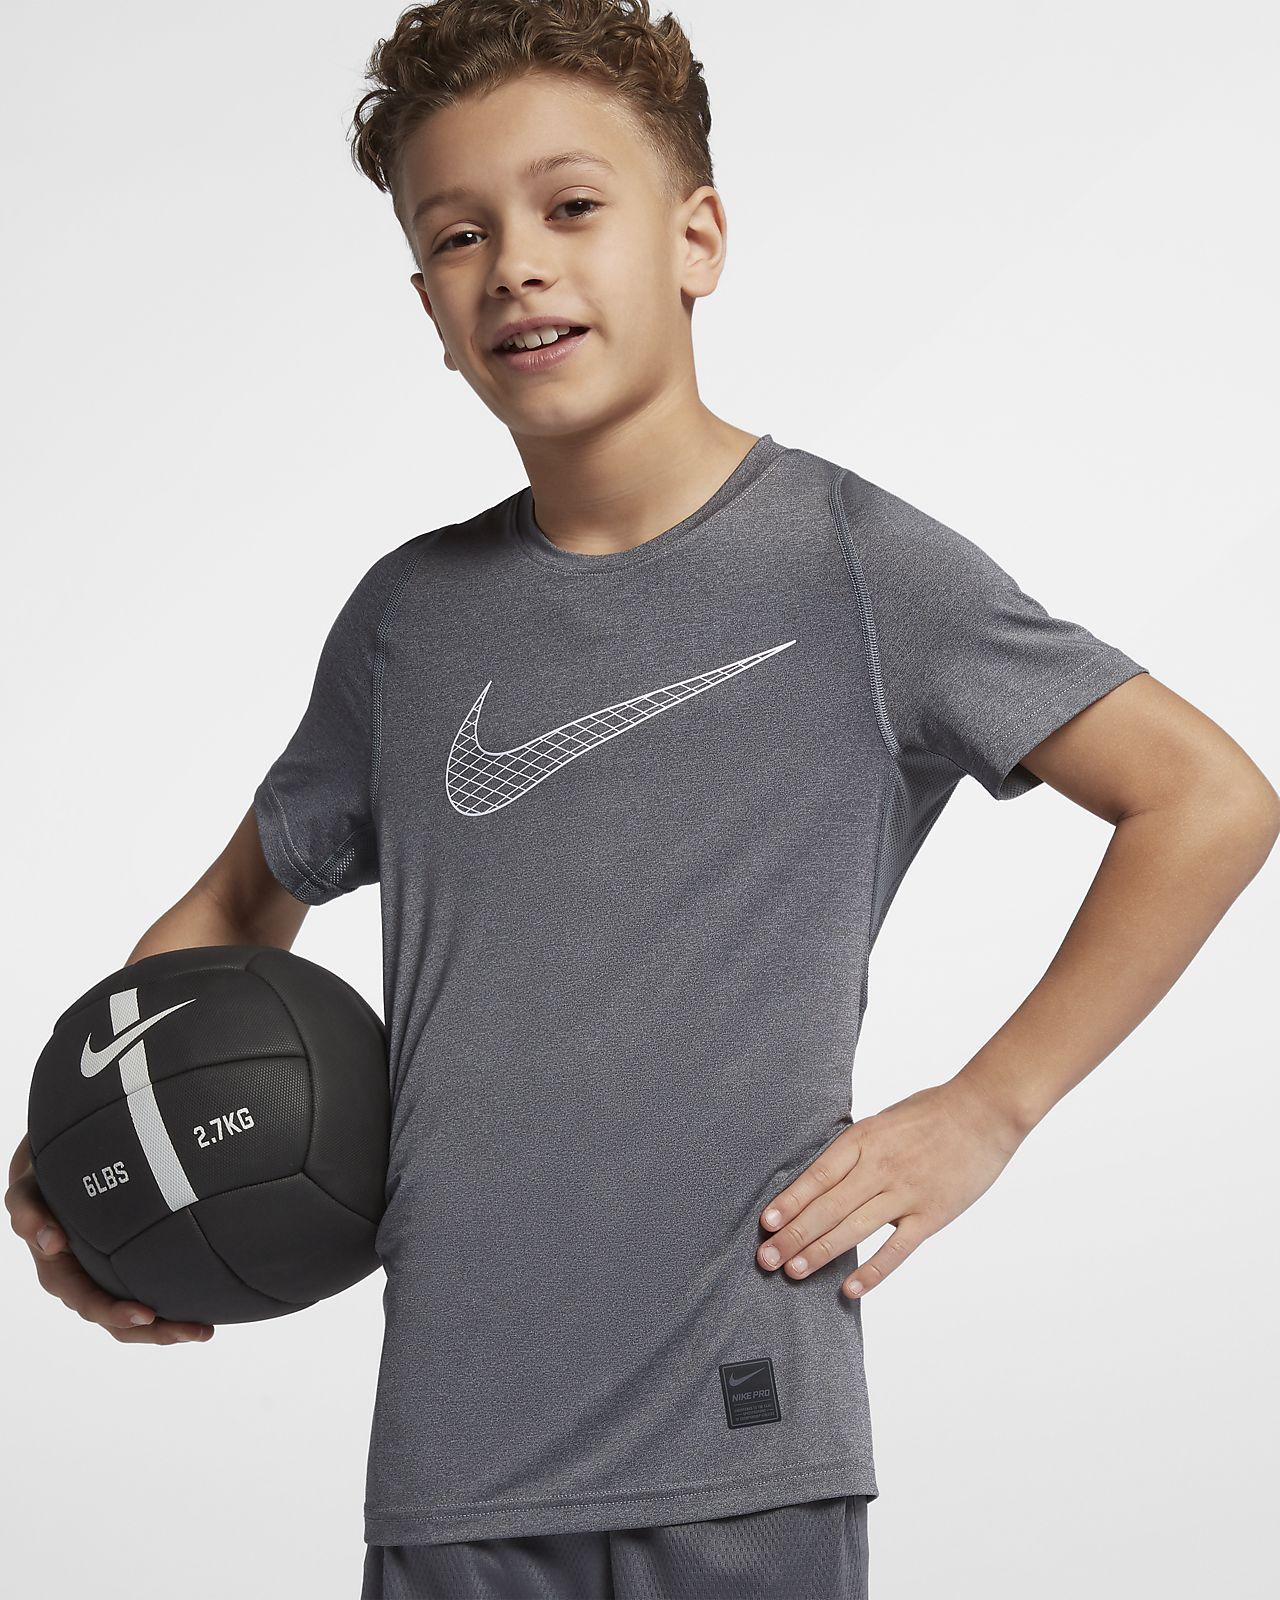 Camiseta de entrenamiento manga corta para niños Nike Pro Big Kids'